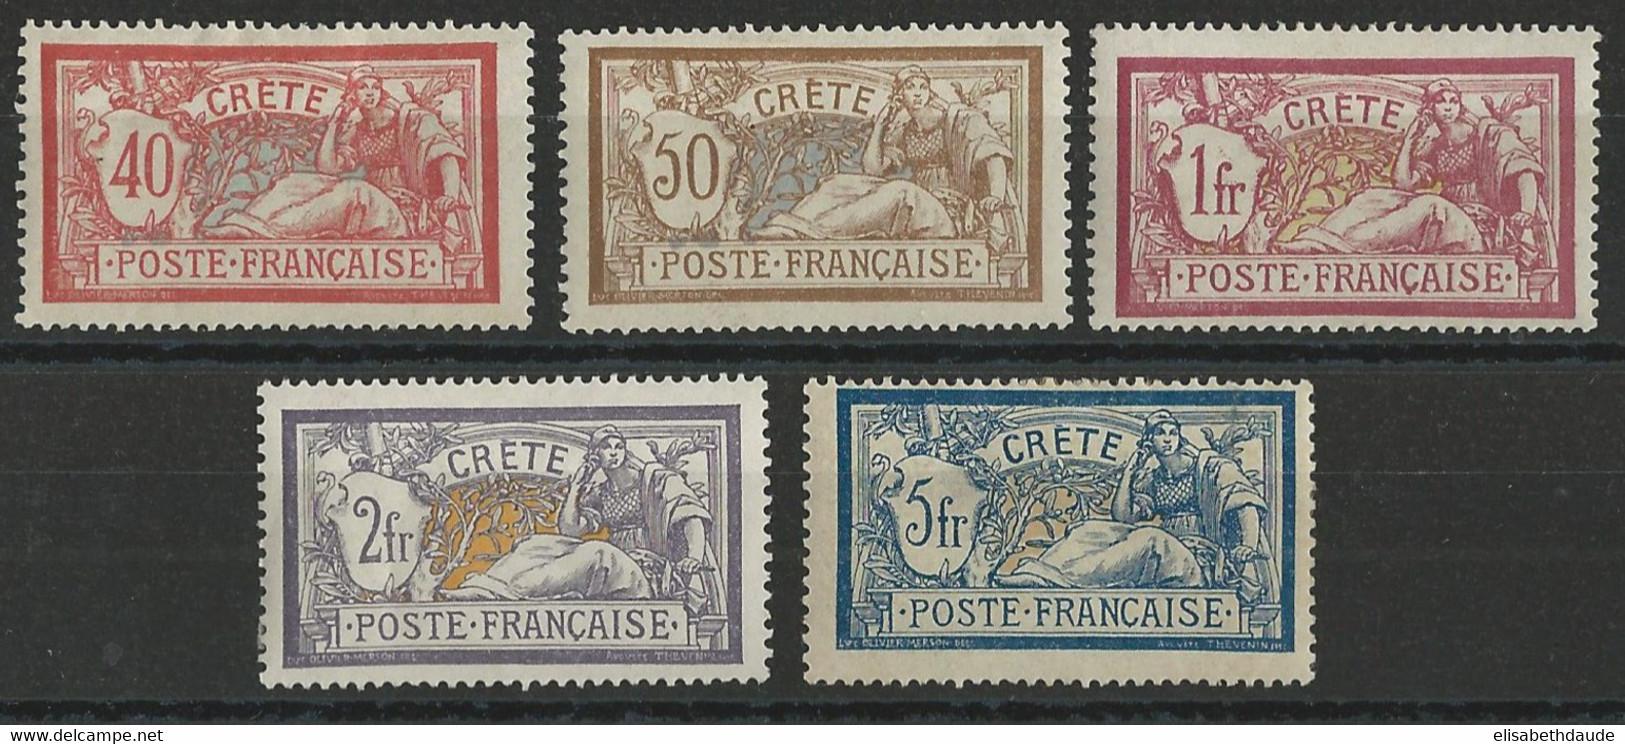 CRETE - YVERT N°11/15 * MH - COTE = 187 EUR. - CHARNIERES CORRECTES - MERSON - Unused Stamps